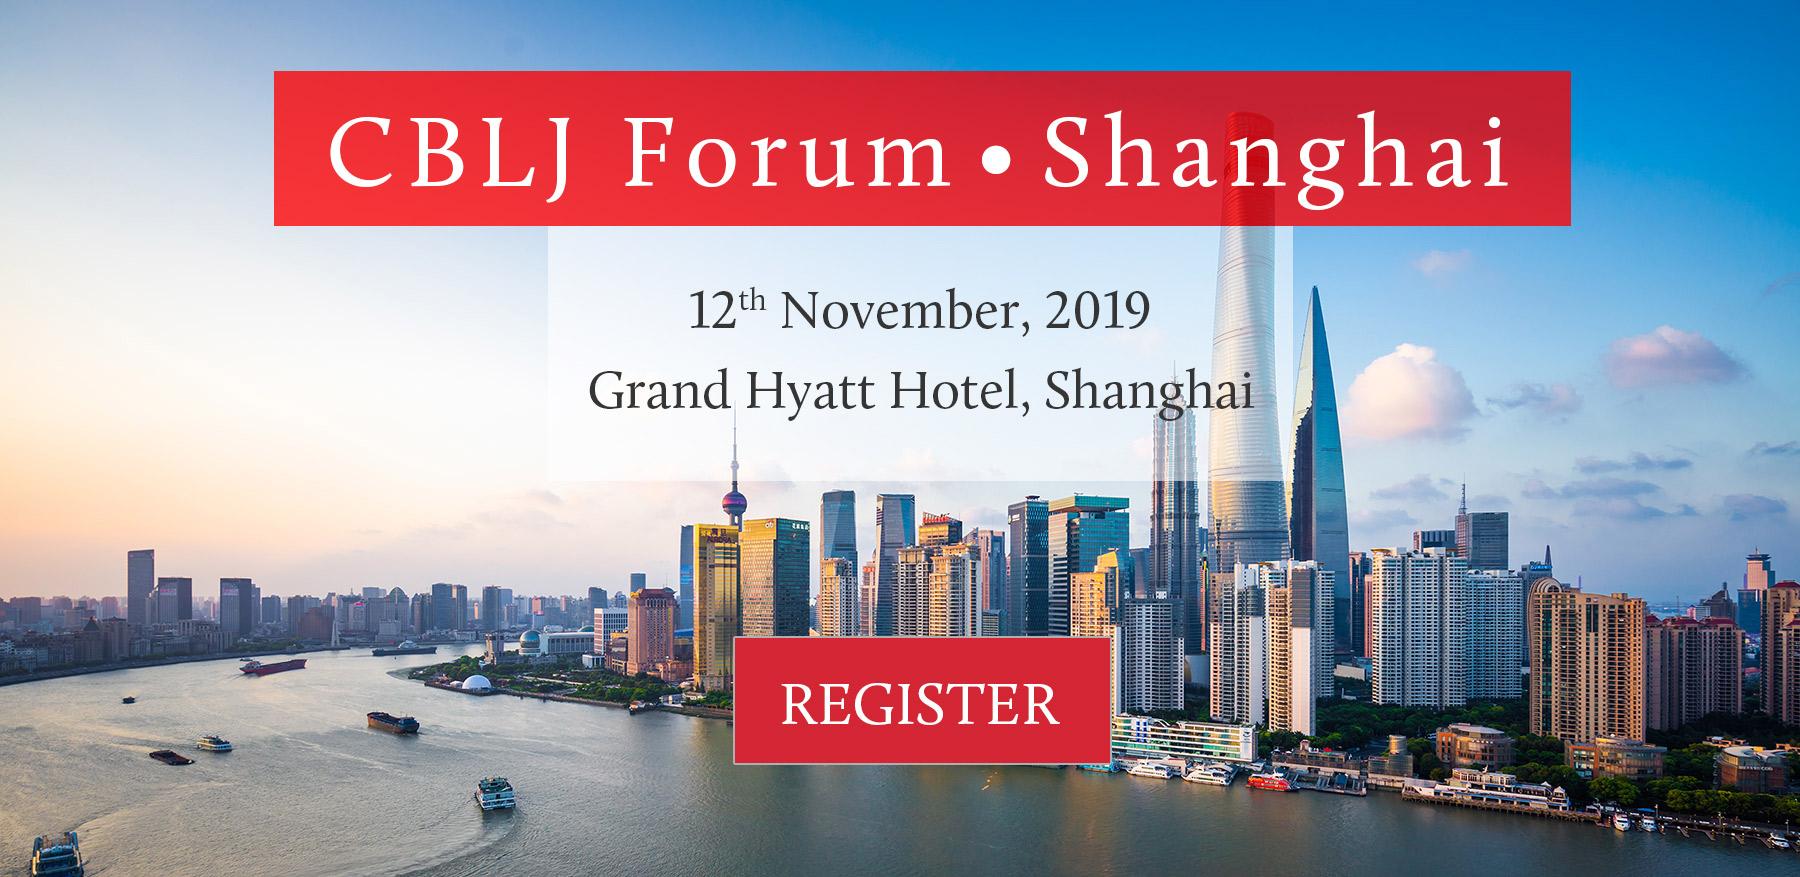 Shanghai-leading-lawyers-law-firms-cross-border-investment-CBLJ-Forum-0925-Spot